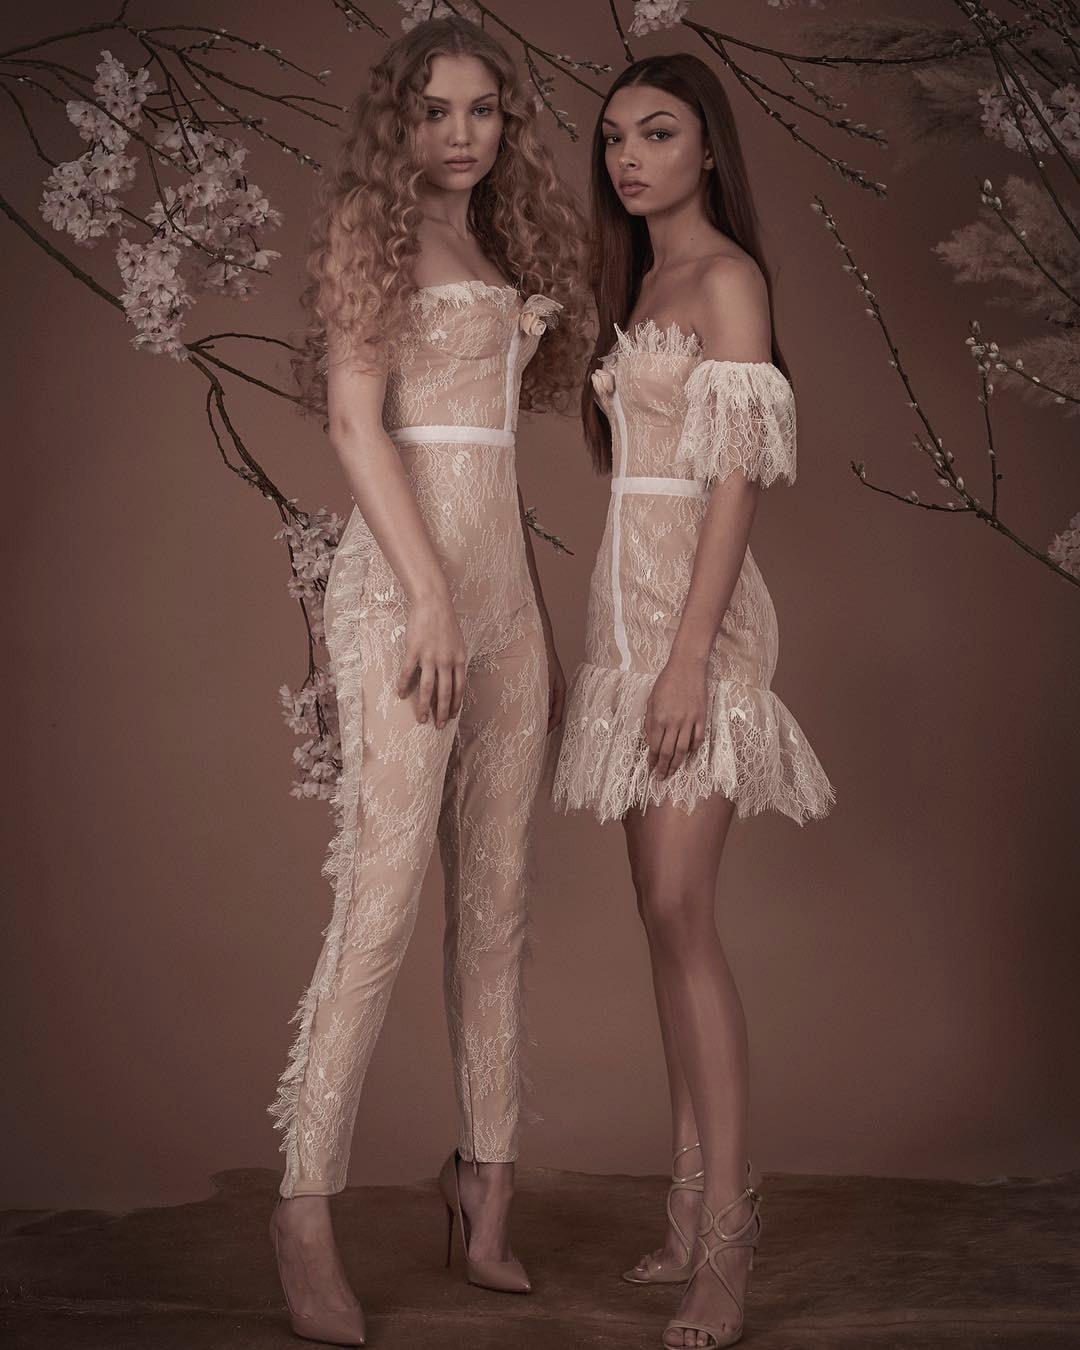 White Lace Slash Neck Fashion Sexy Rayon Bandage Dress High Quality Club Party Dress